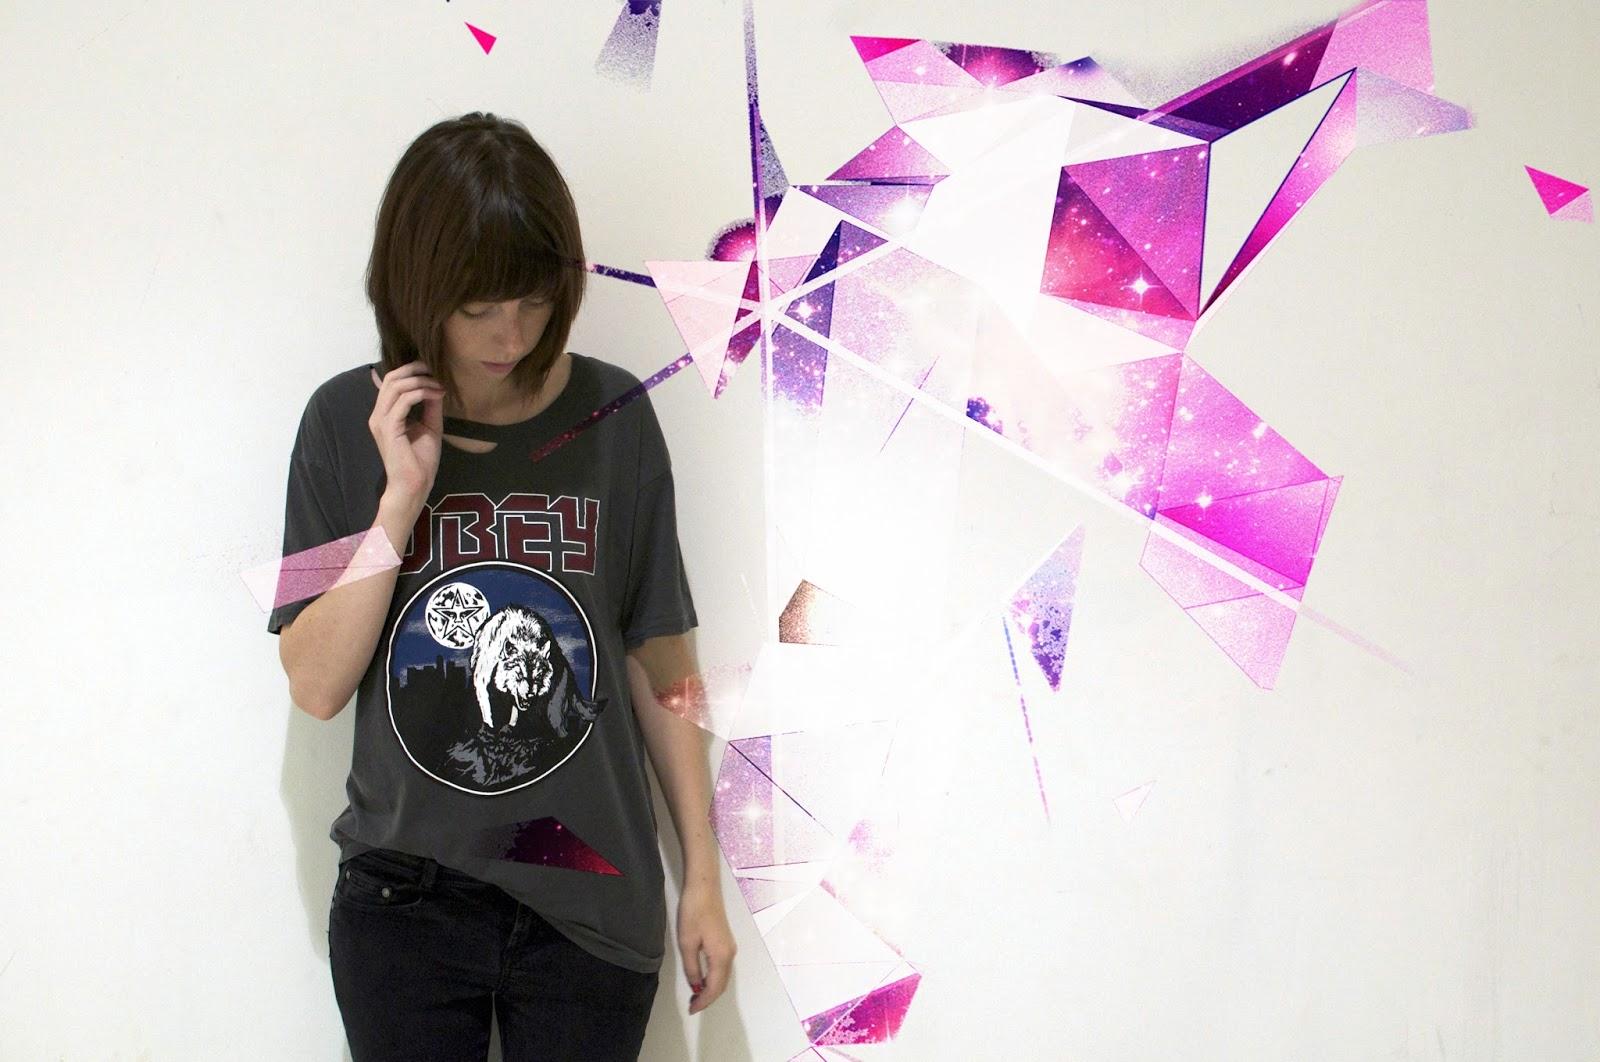 UK street style, obey style, women's obey fashion,